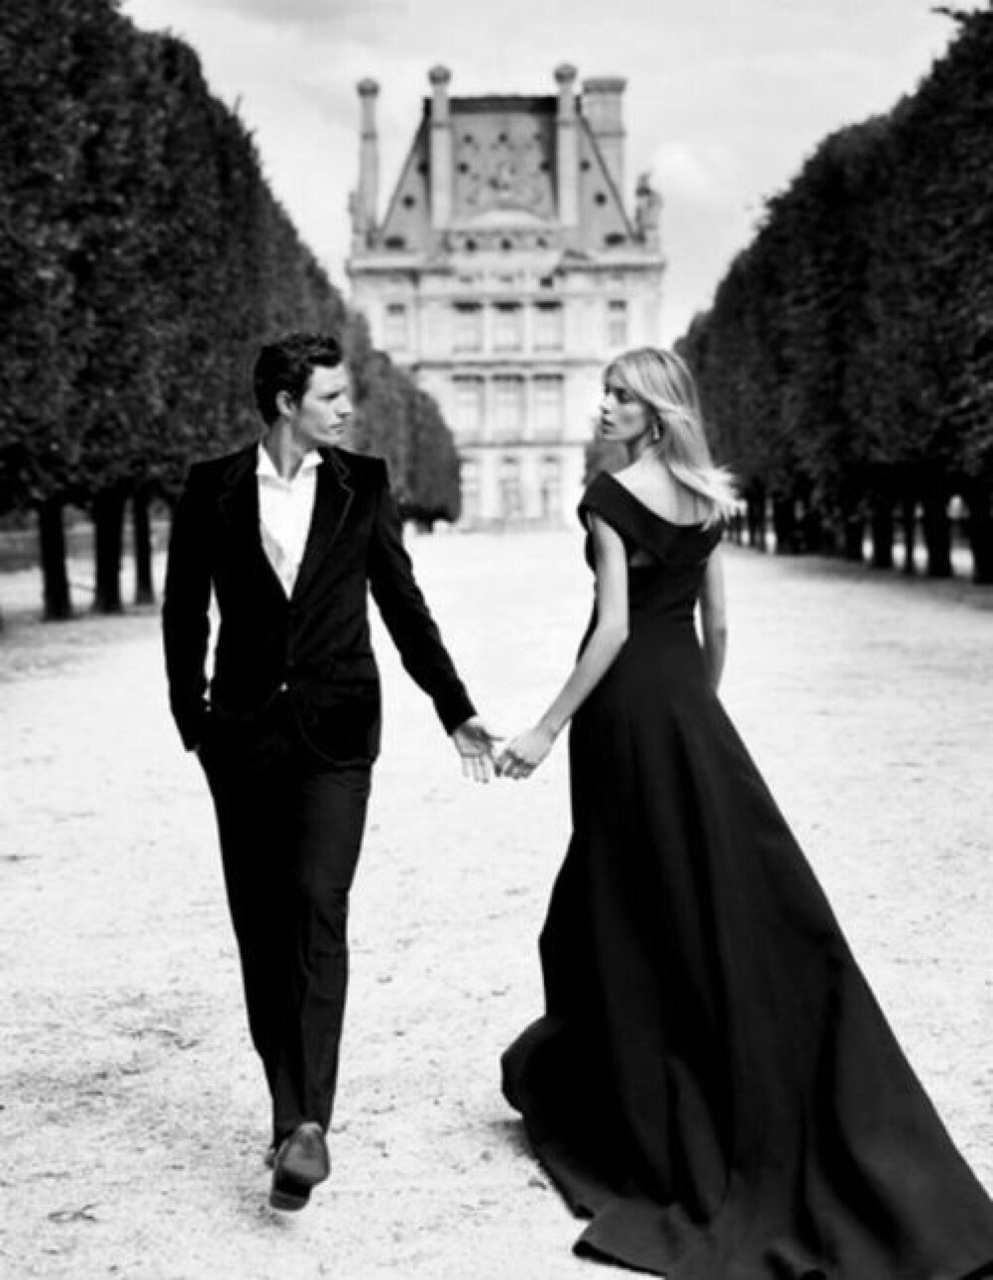 Black dress we heart it - Black Dress We Heart It 19